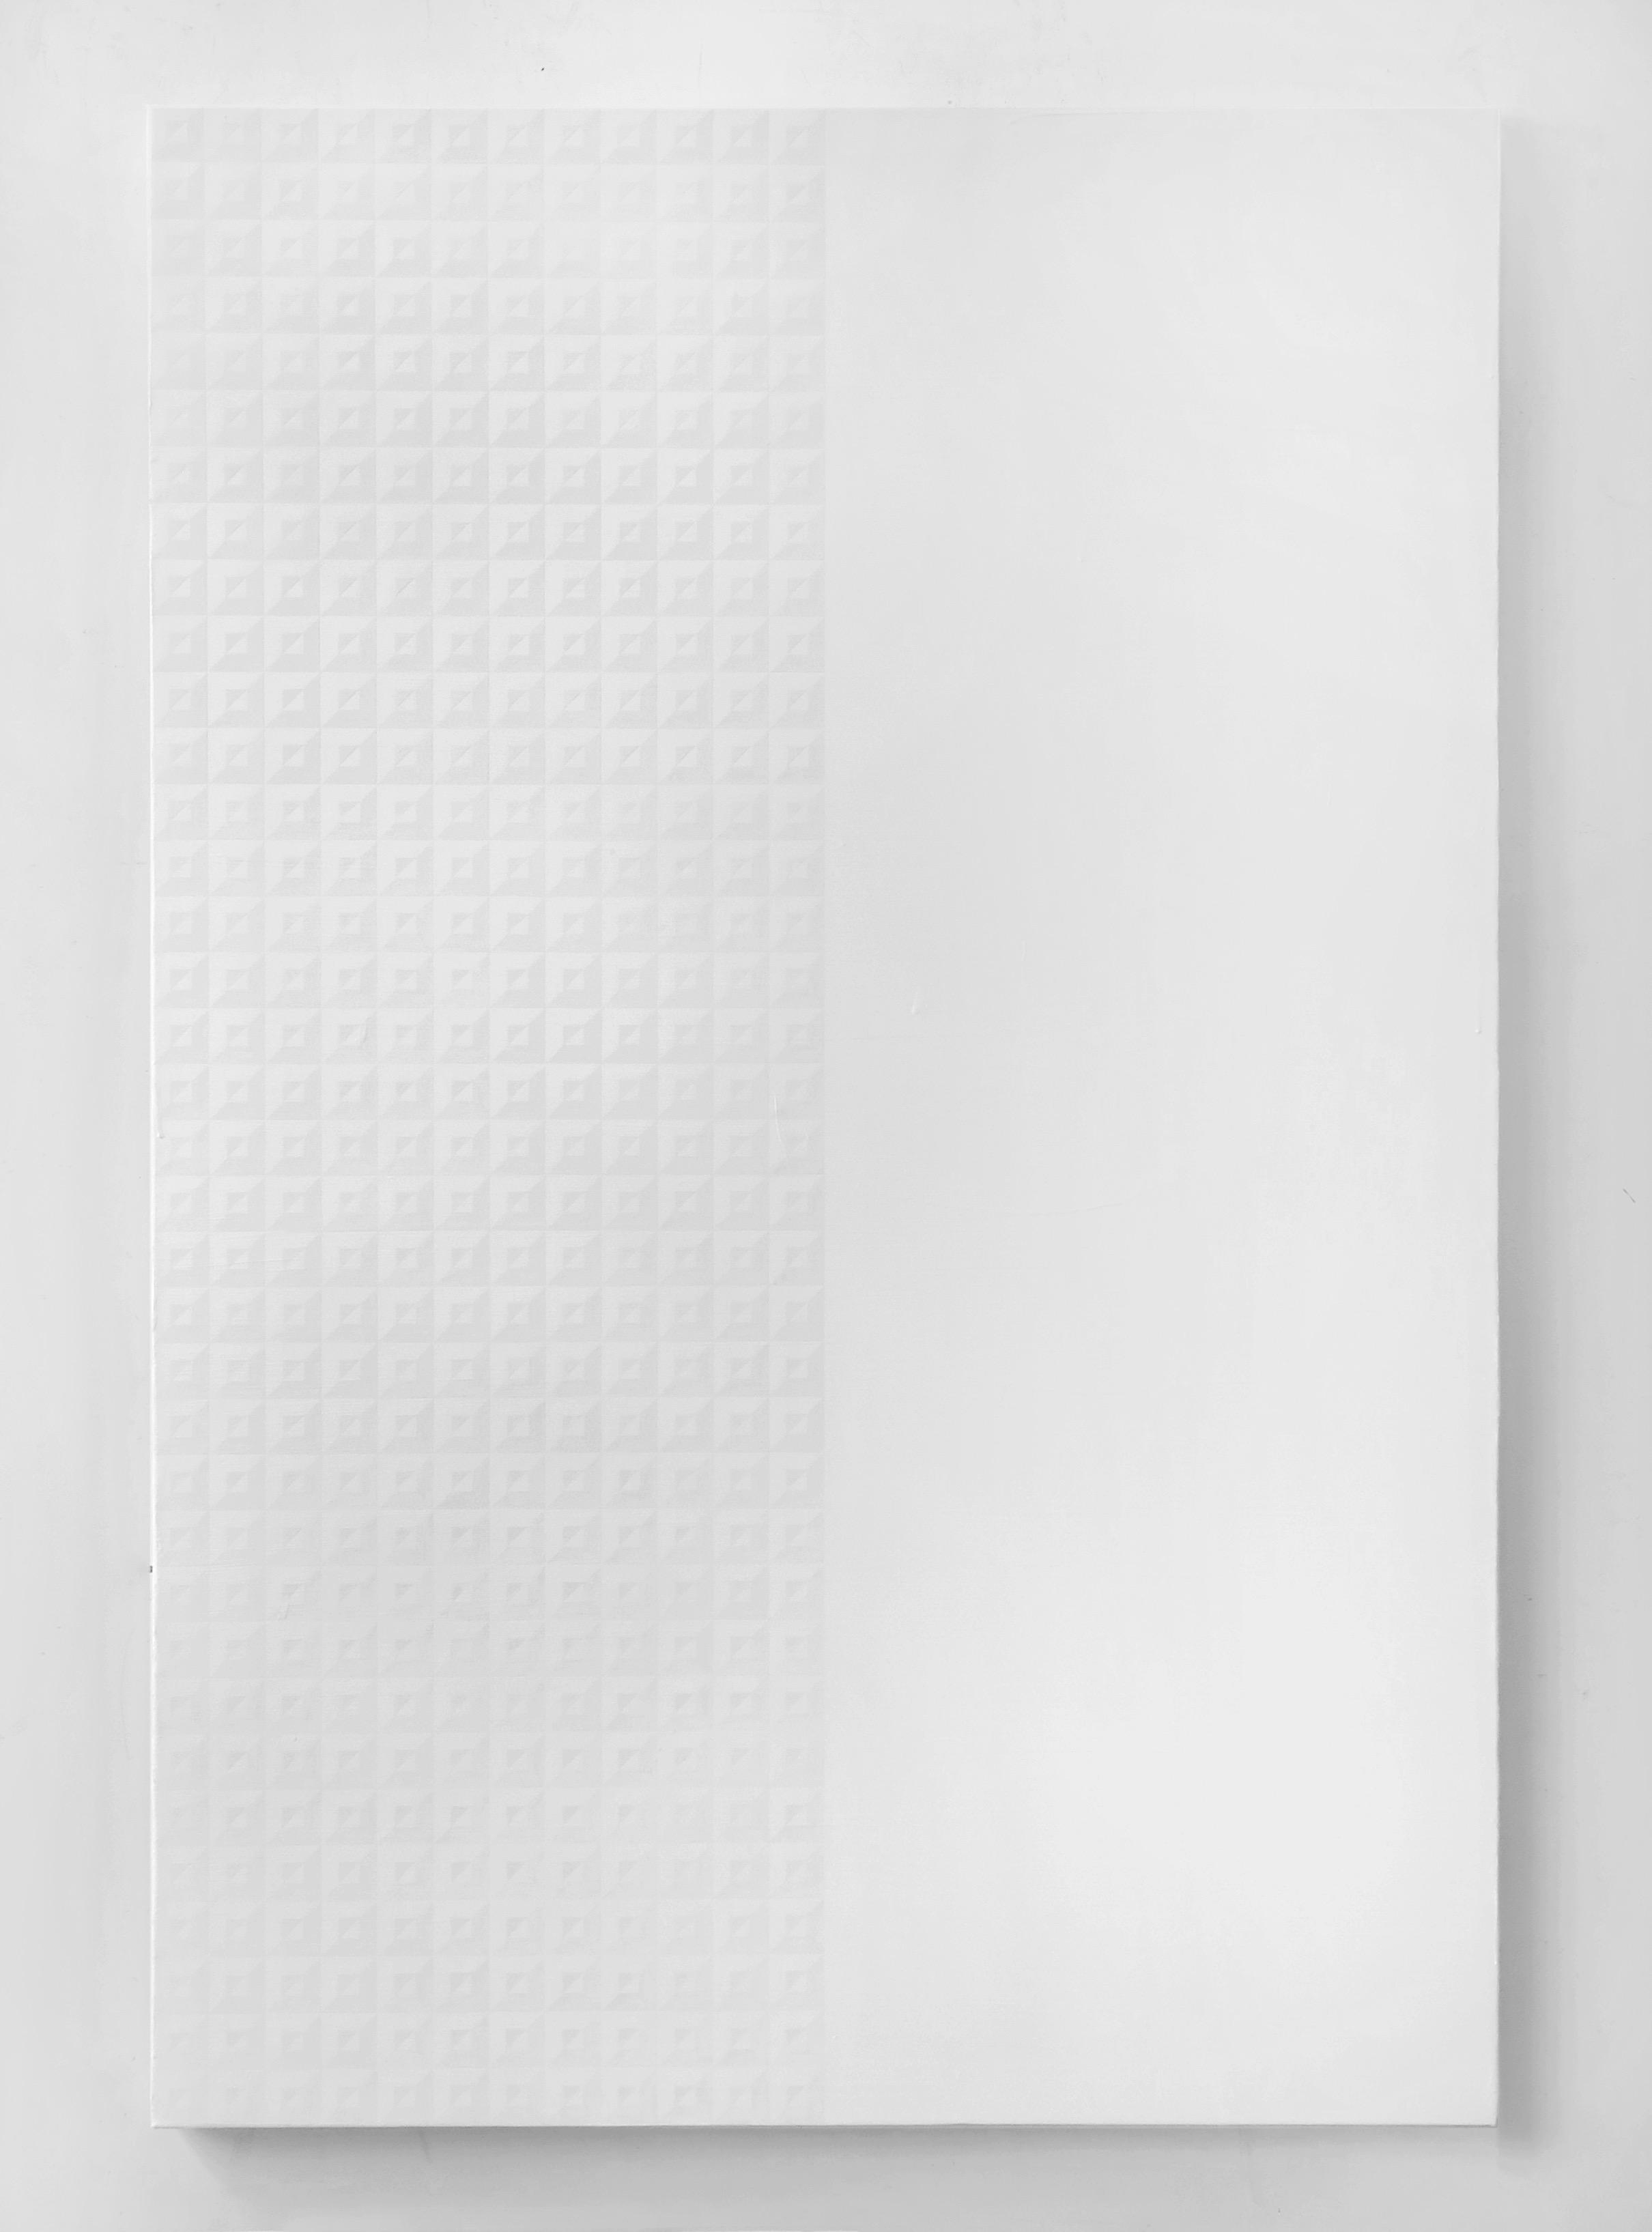 Matt Mignanelli  Titan , 2014 Gloss and matte enamel on canvas, 72 x 48 inches